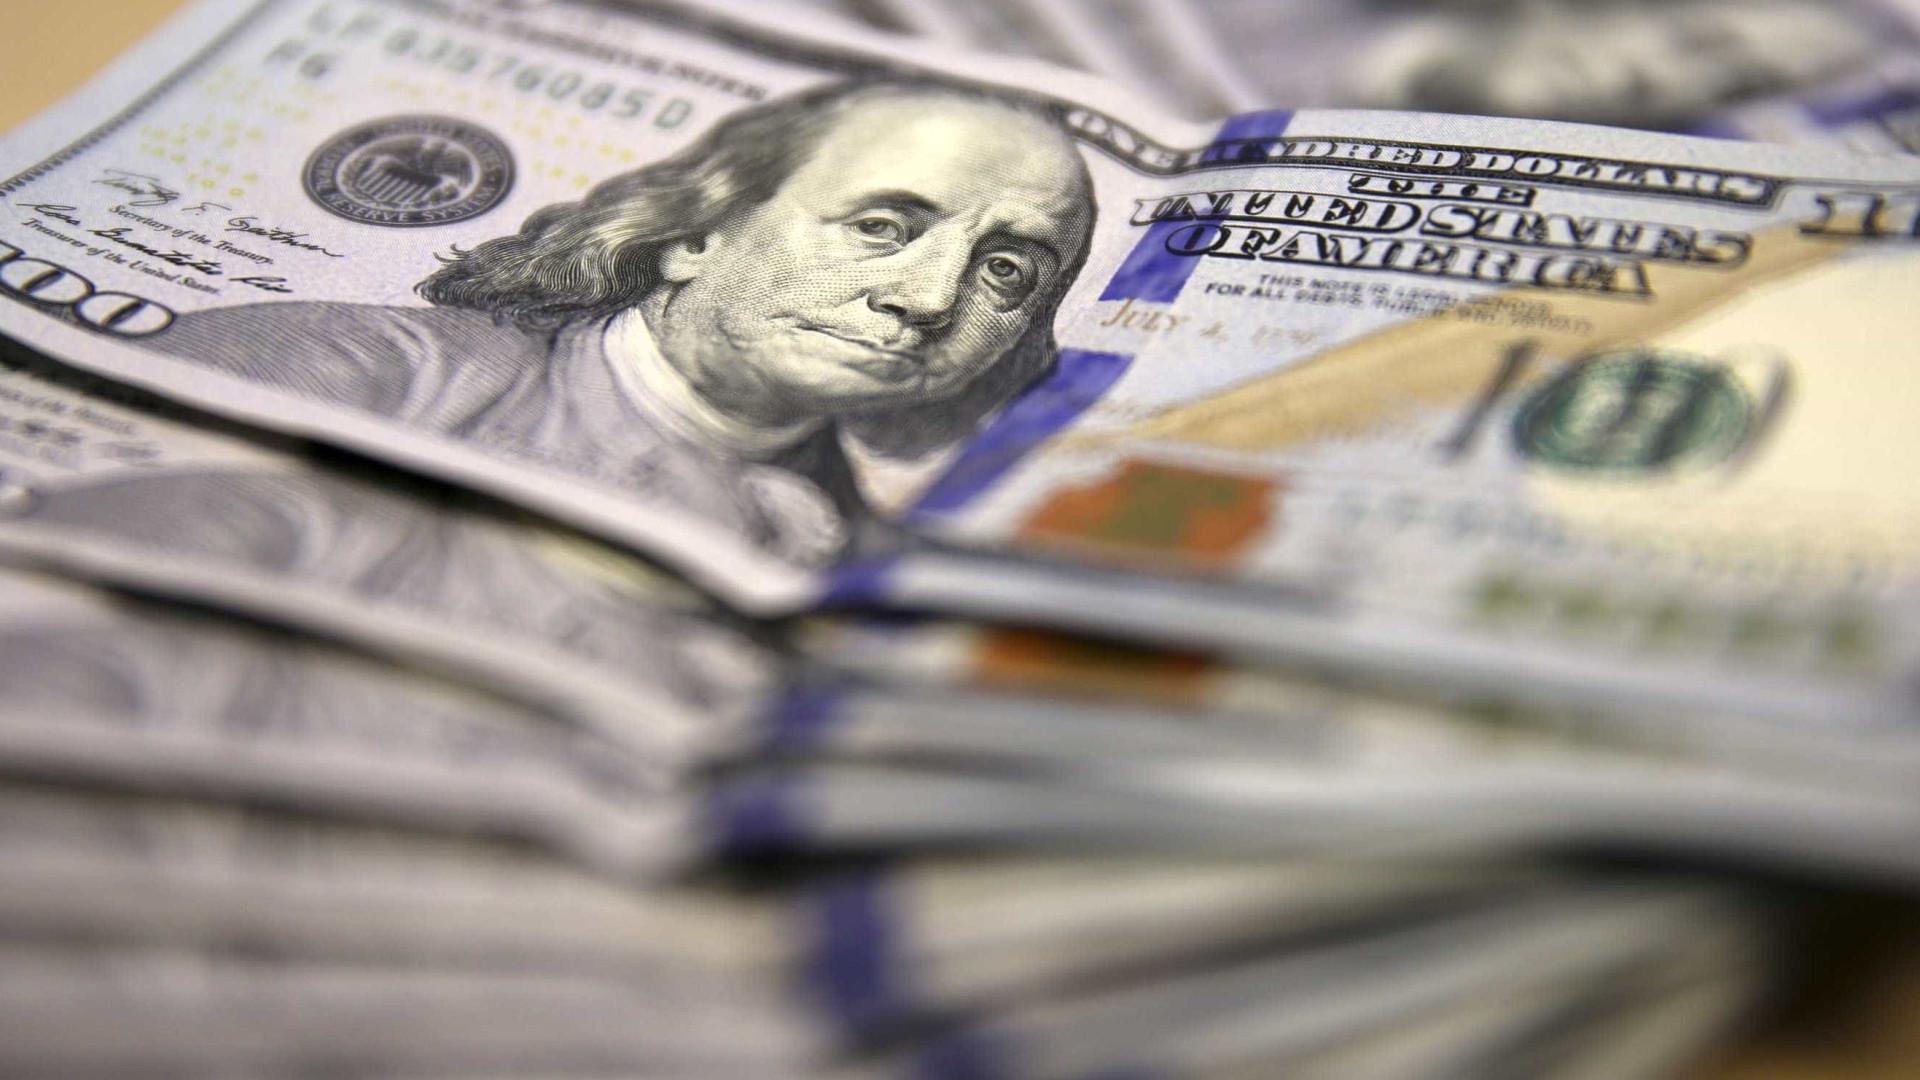 Património mundial das grandes fortunas ultrapassa 70 biliões de dólares